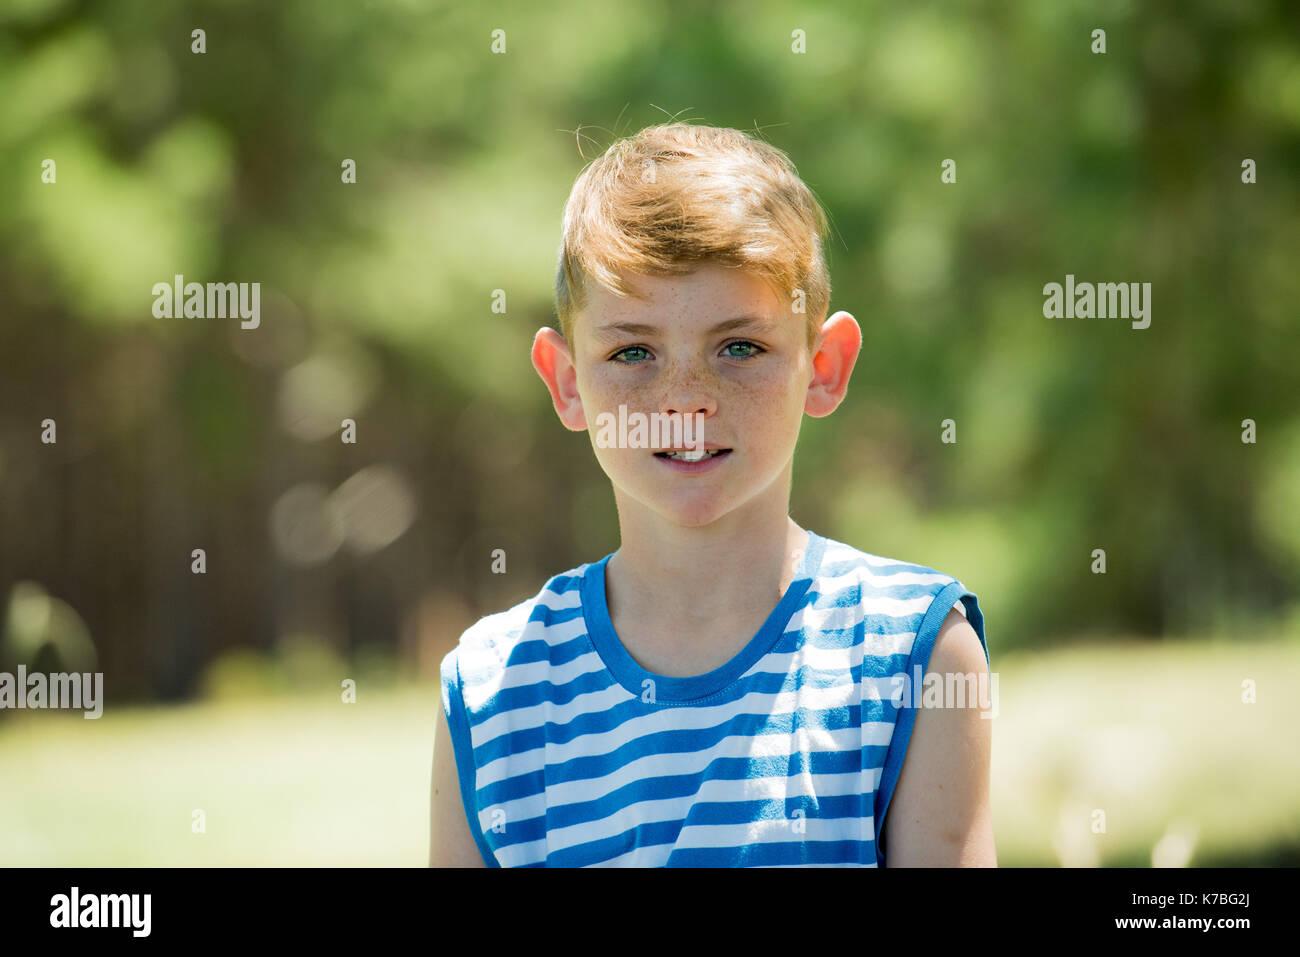 Boy outdoors, portrait - Stock Image